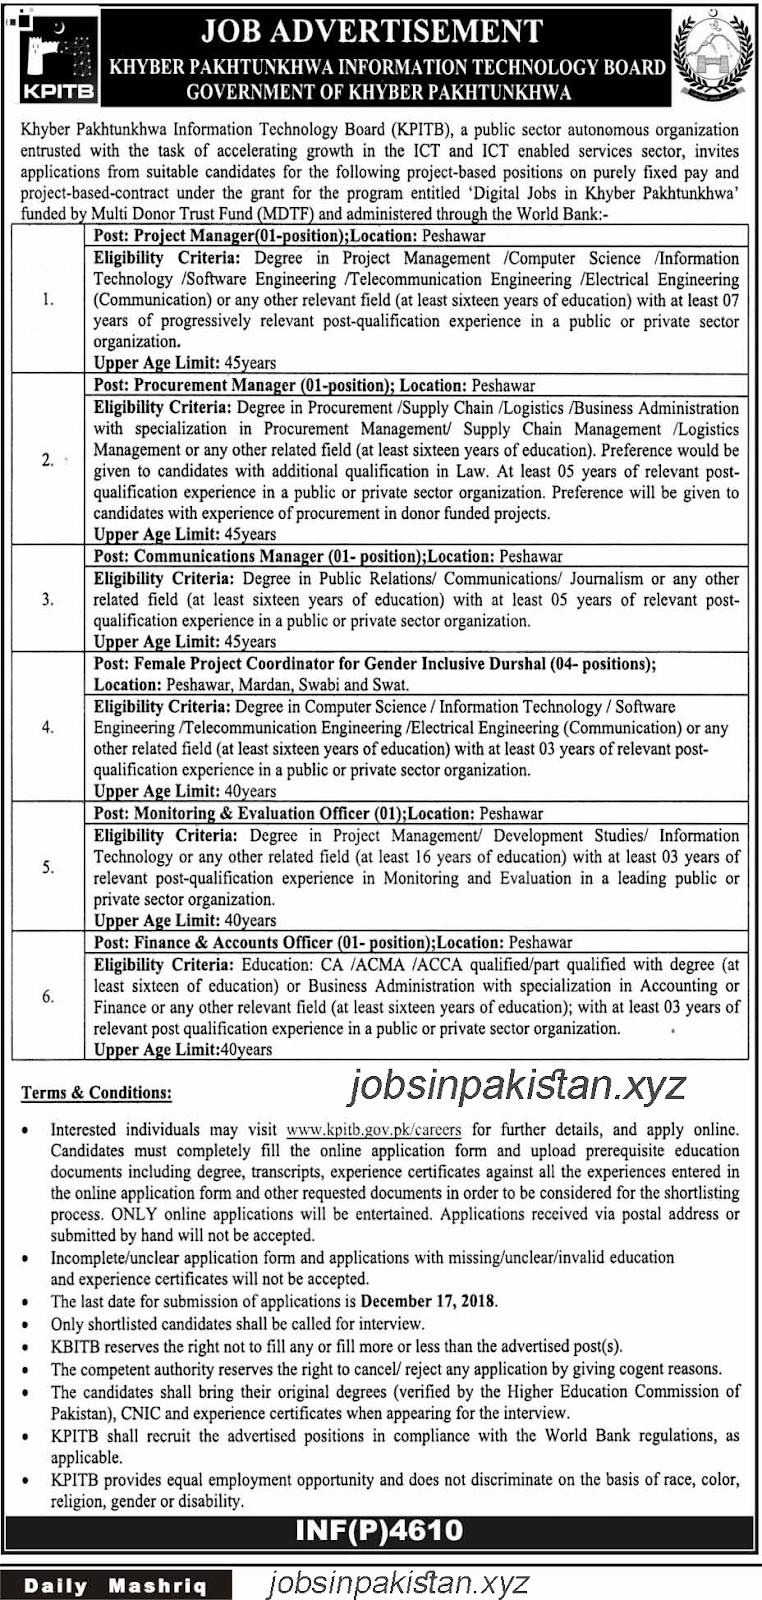 Advertisement for Khyber Pakhtunkhwa Information Technology Board Jobs 2018